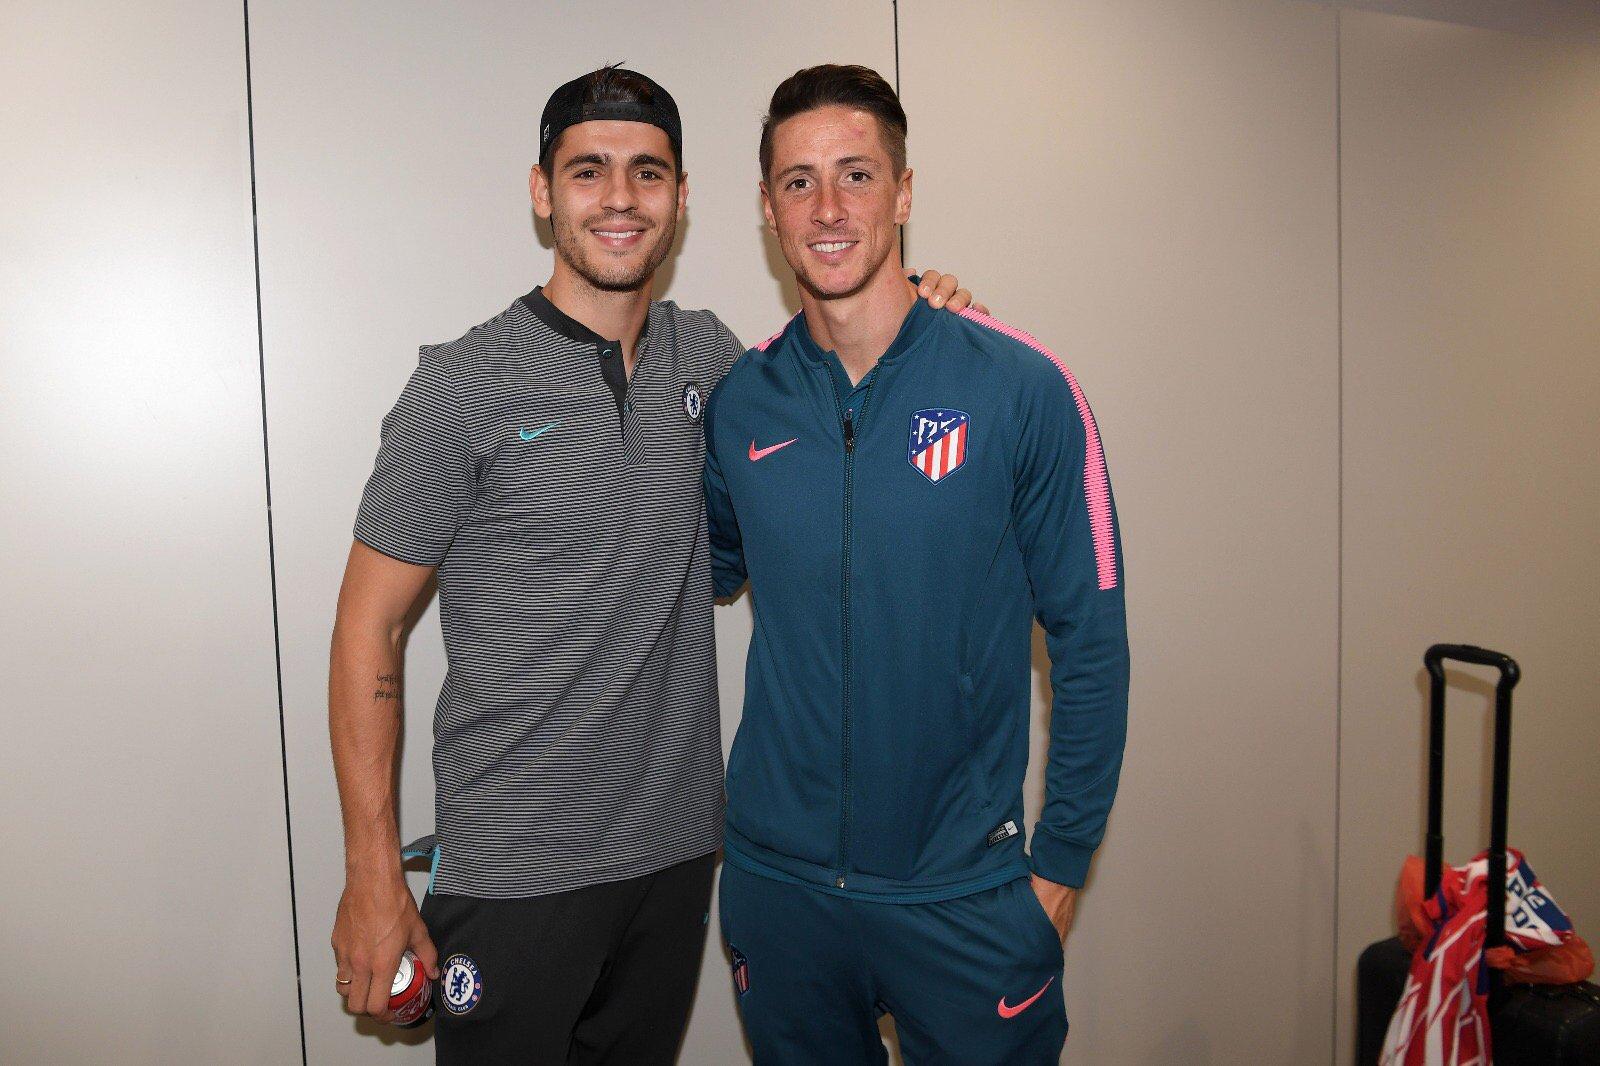 ¿Cuánto mide Fernando Torres? - Real height DKw8UfQW4AAftpZ?format=jpg&name=orig